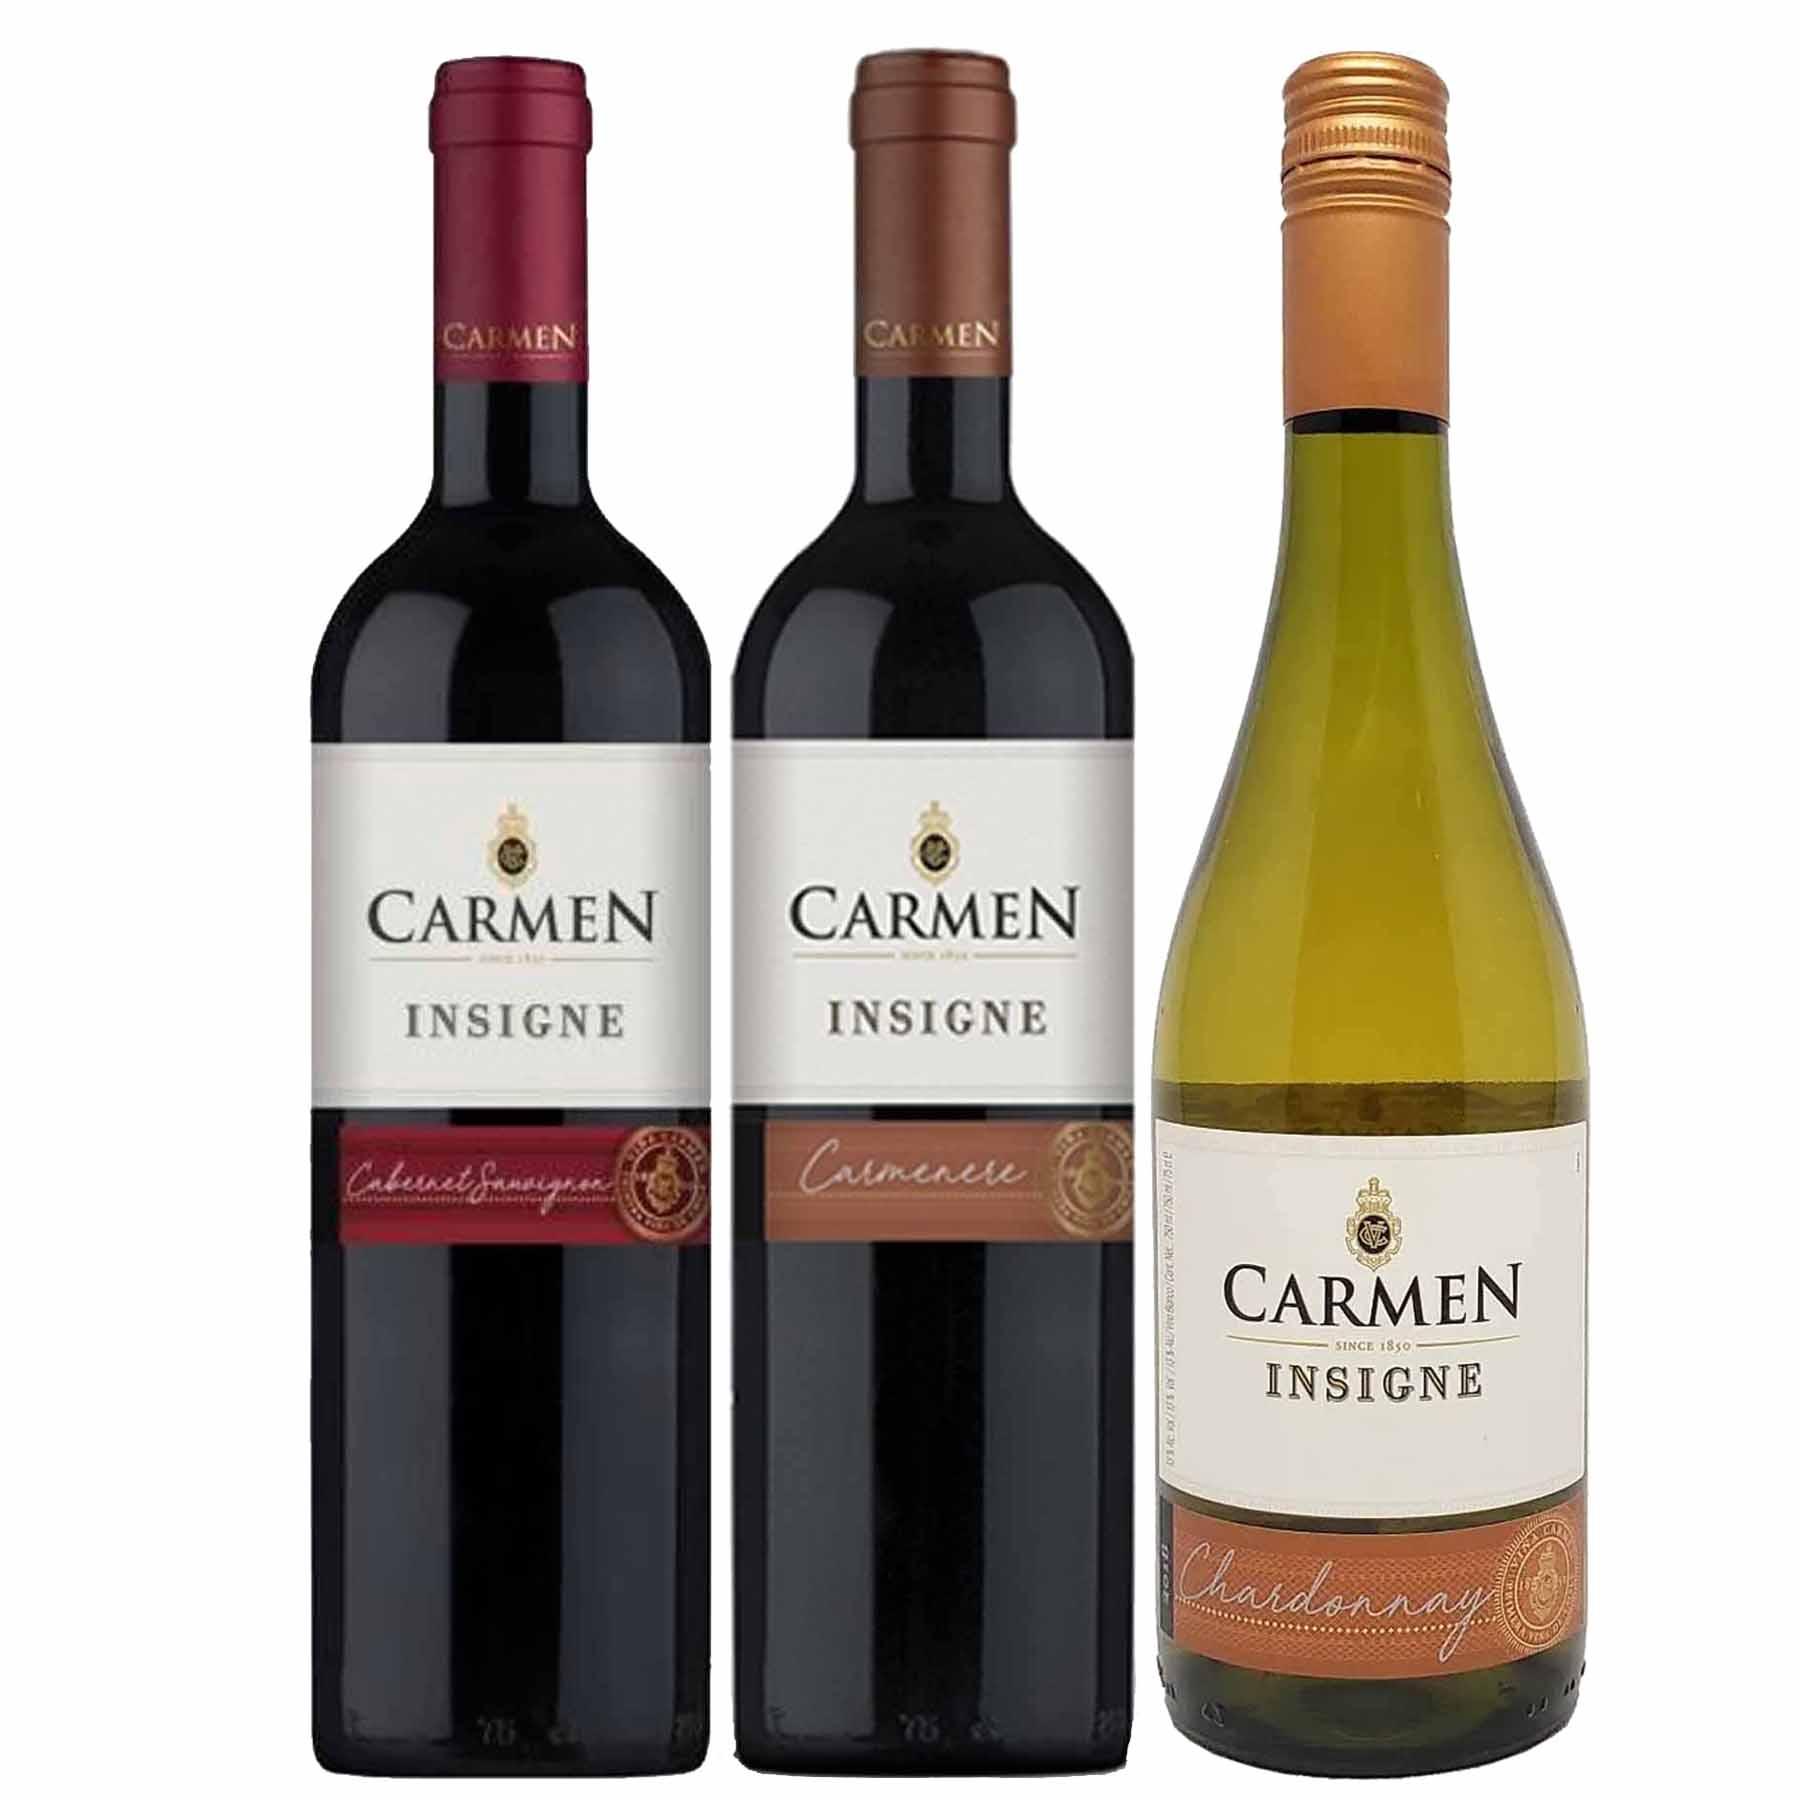 Kit 3 Vinhos Chilenos Carmen Insigne Cabernet Sauvignon, Carmenere e Chardonnay